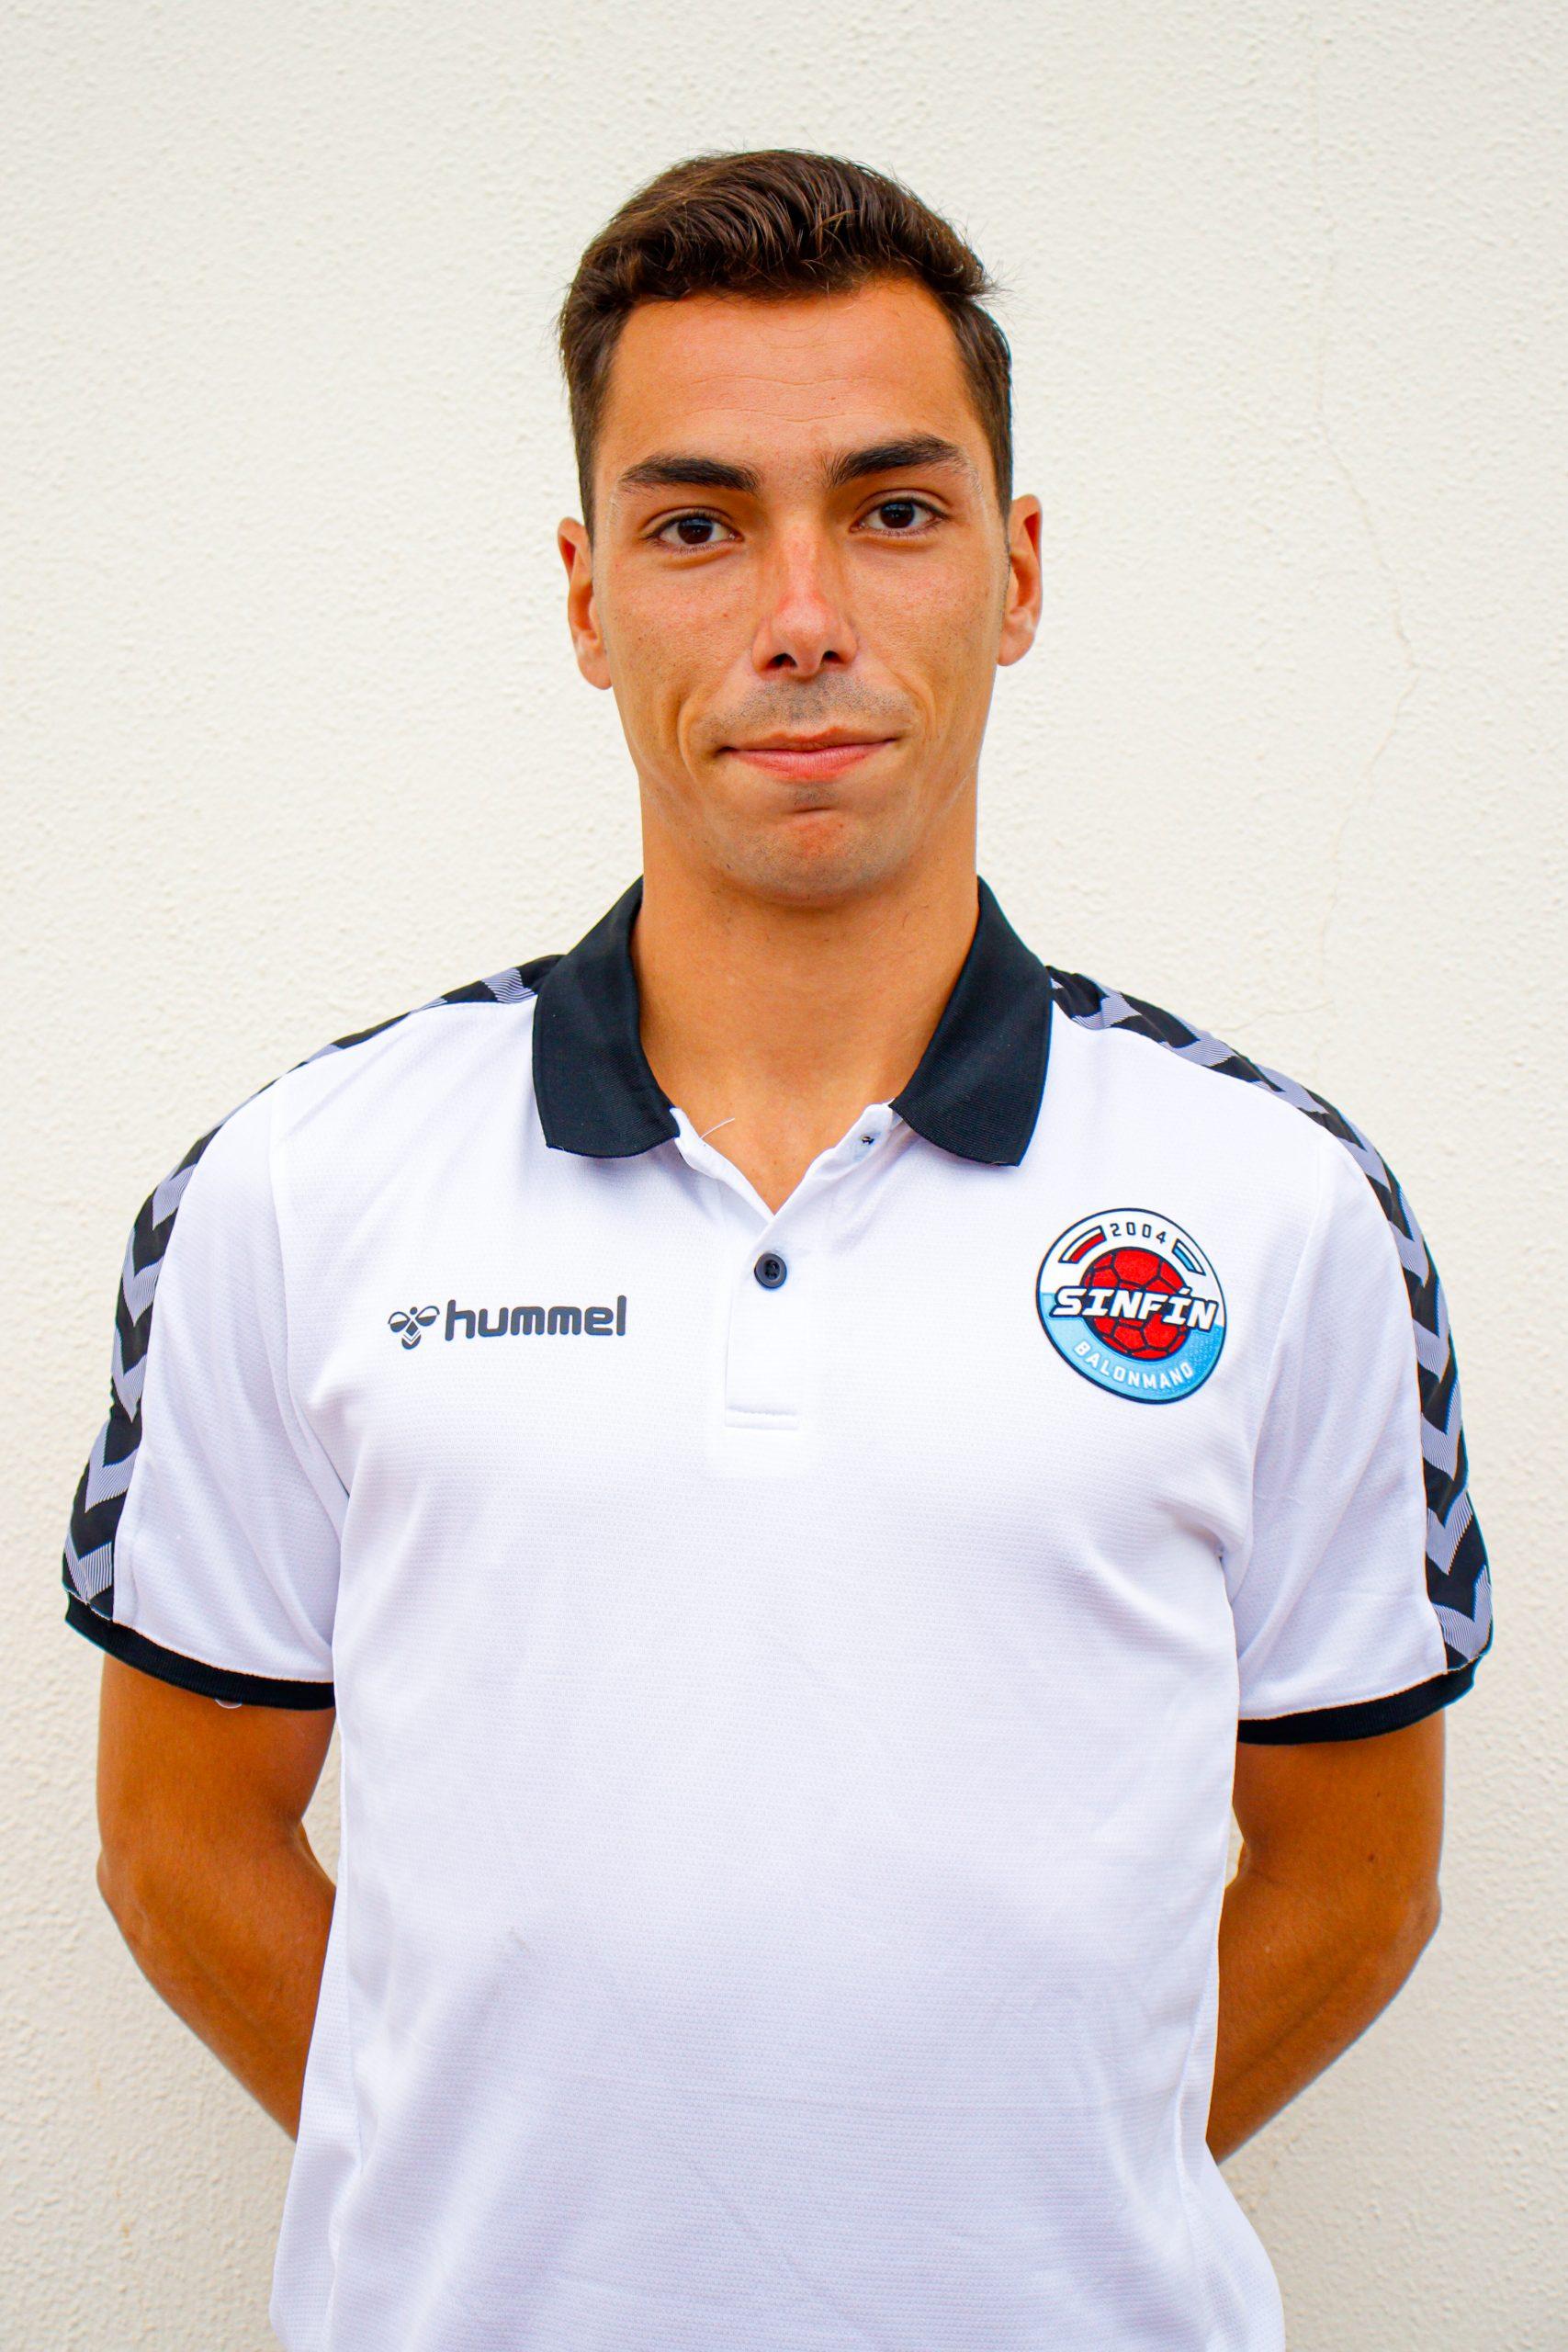 Daniel Salvador Vega